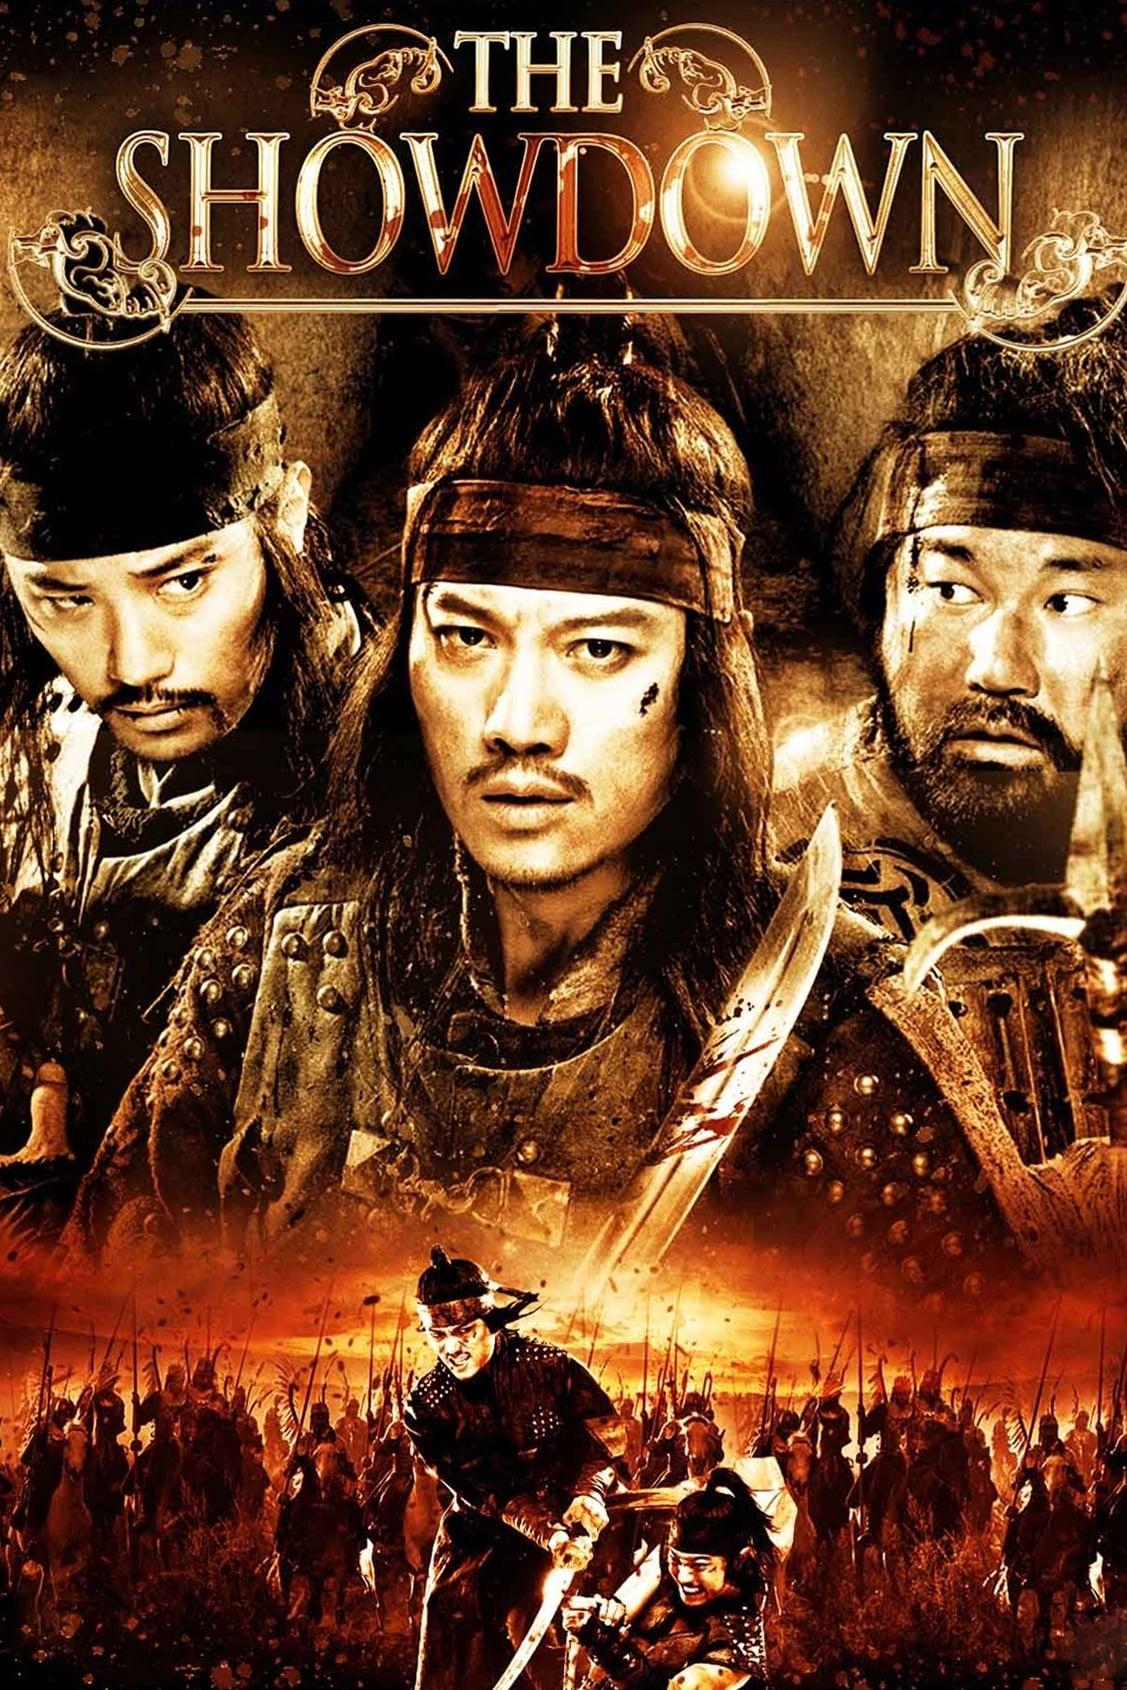 The Showdown (2011)